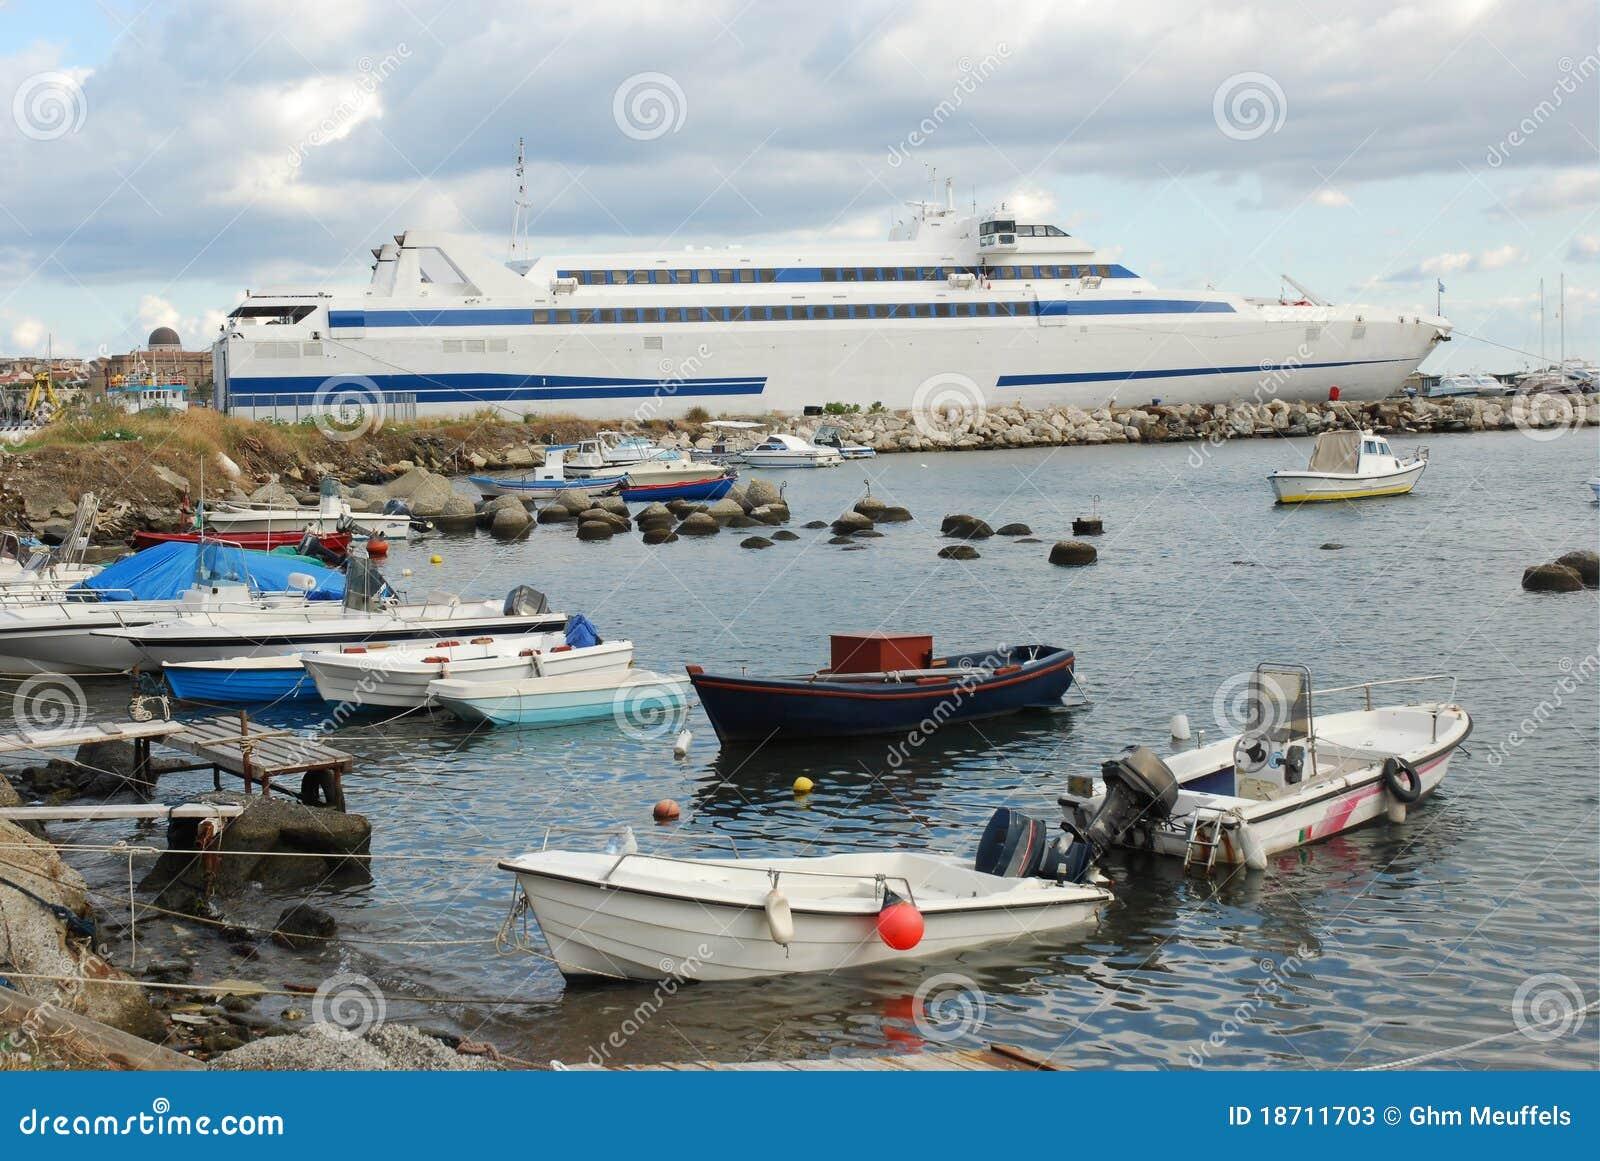 Milazzo harbor Sicily with ferry to Lipari Islands Italy